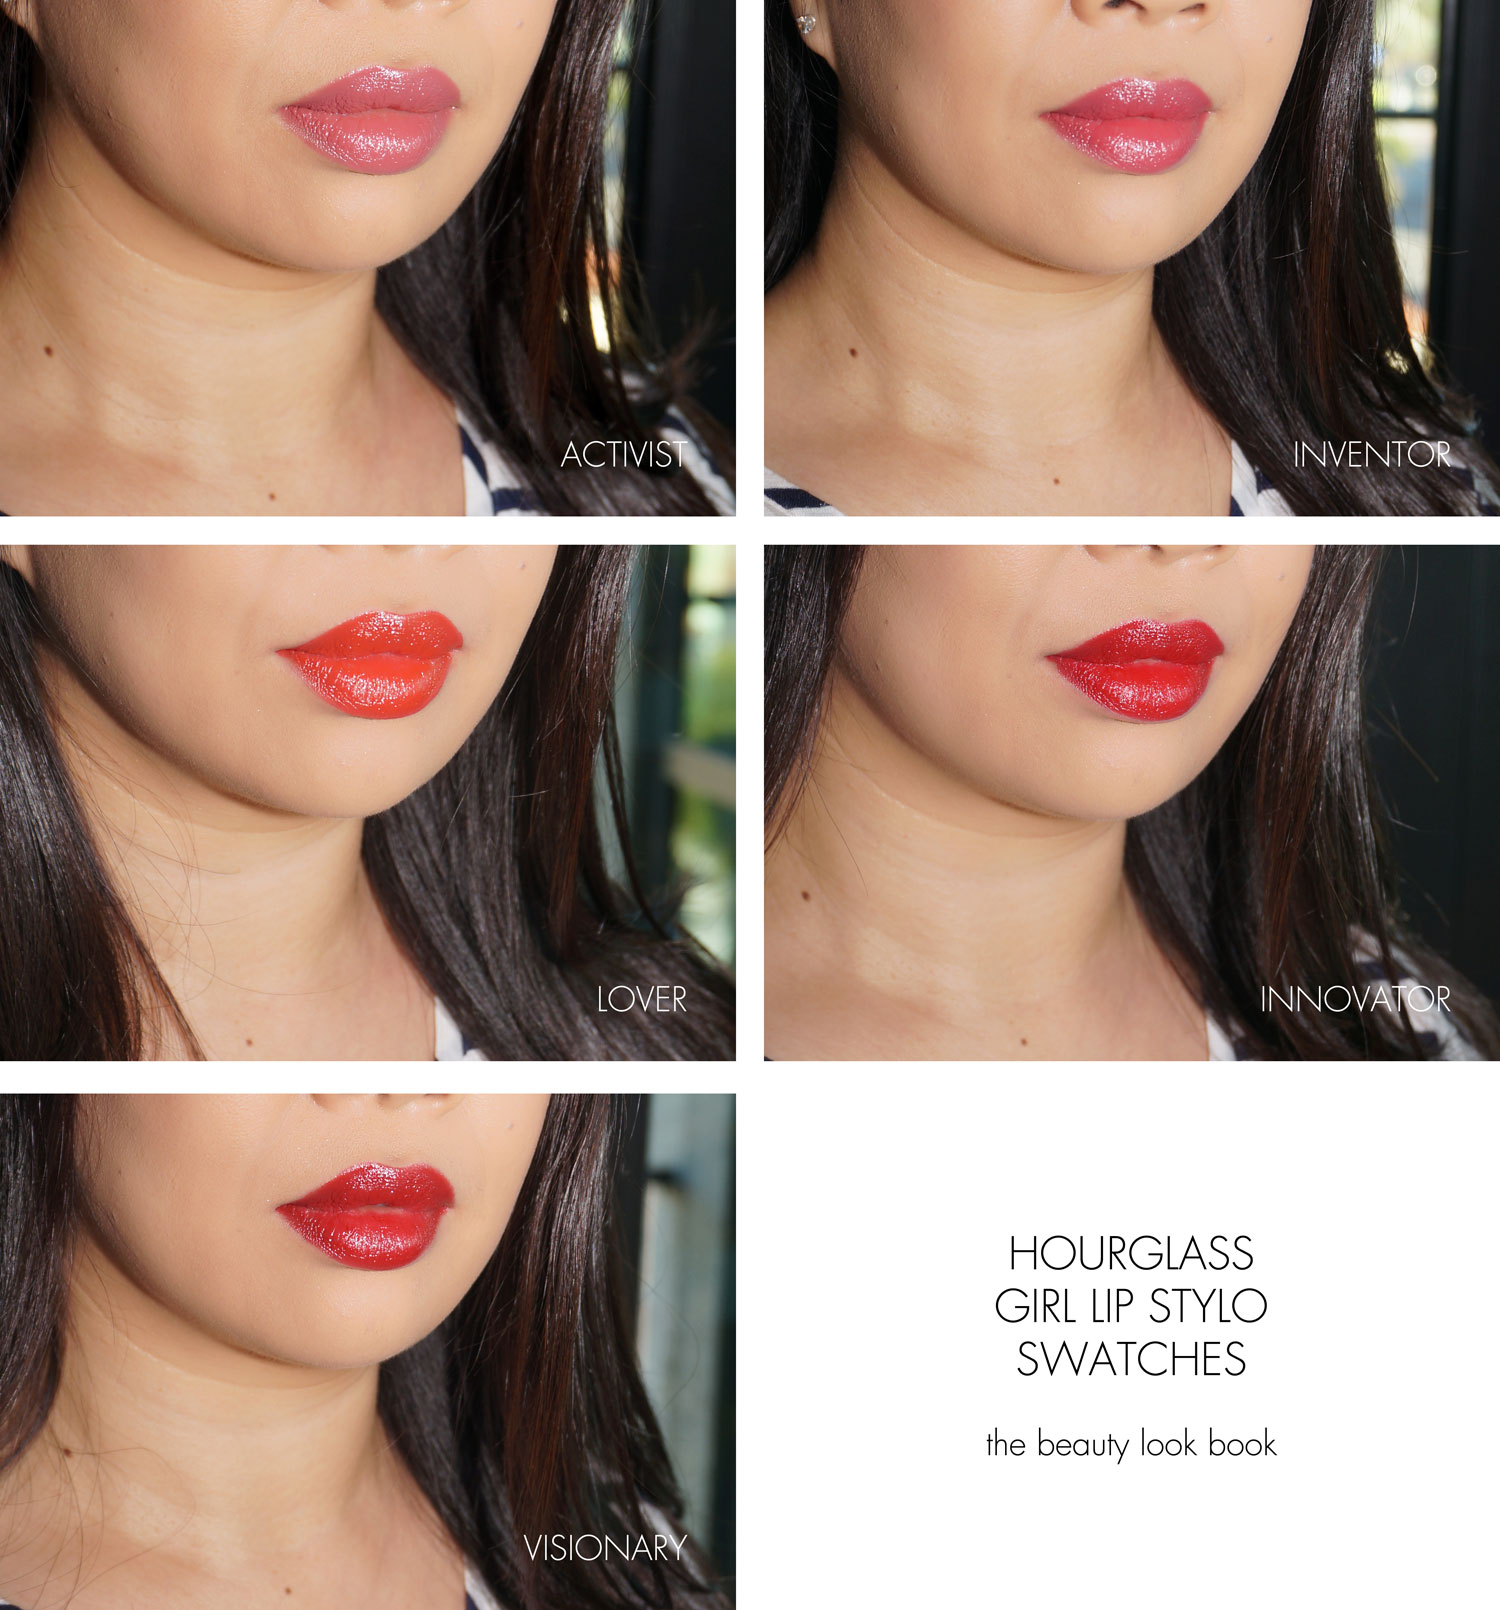 Hourglass Cosmetics GIRL Lip Stylo The Beauty Look Book